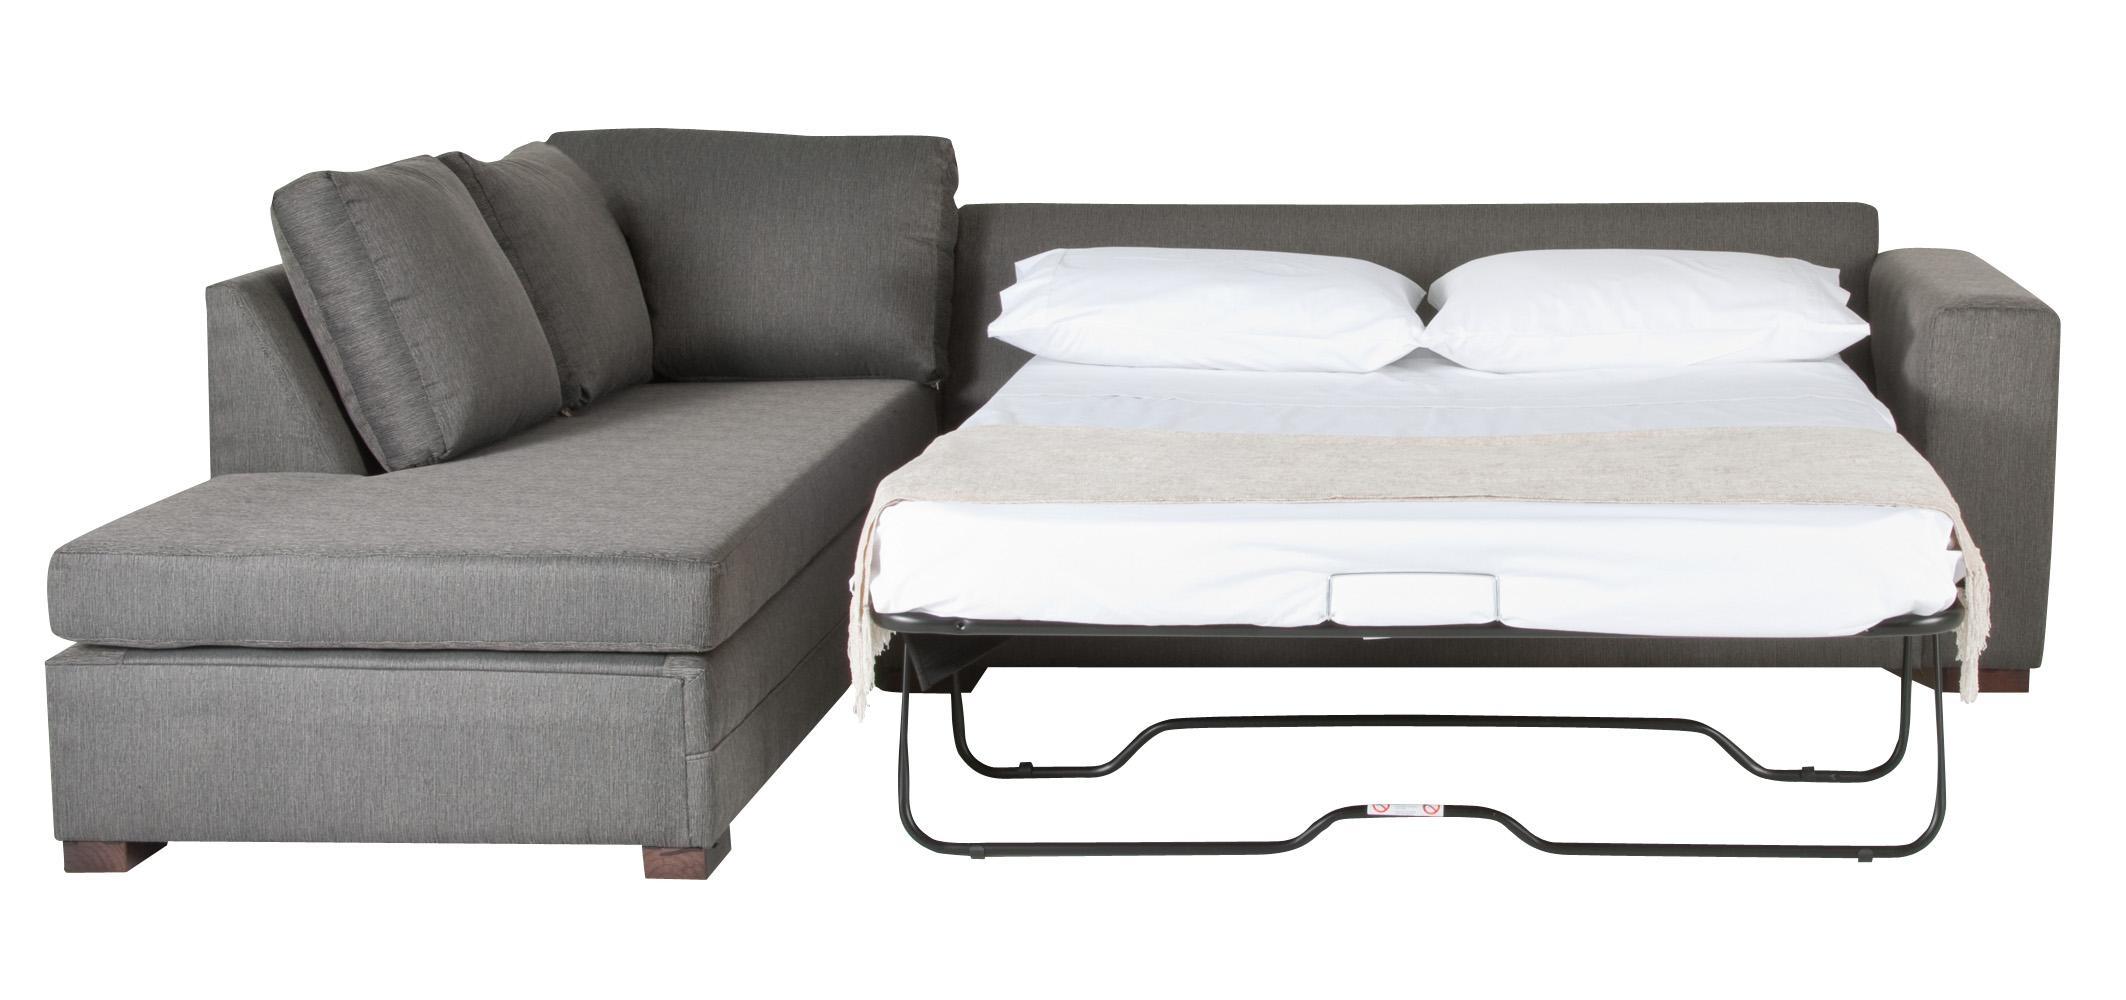 Furniture: Ikea Sleeper Sofa | Ikea Sectional | Kmart Futon For Kmart Sleeper Sofas (Image 1 of 20)